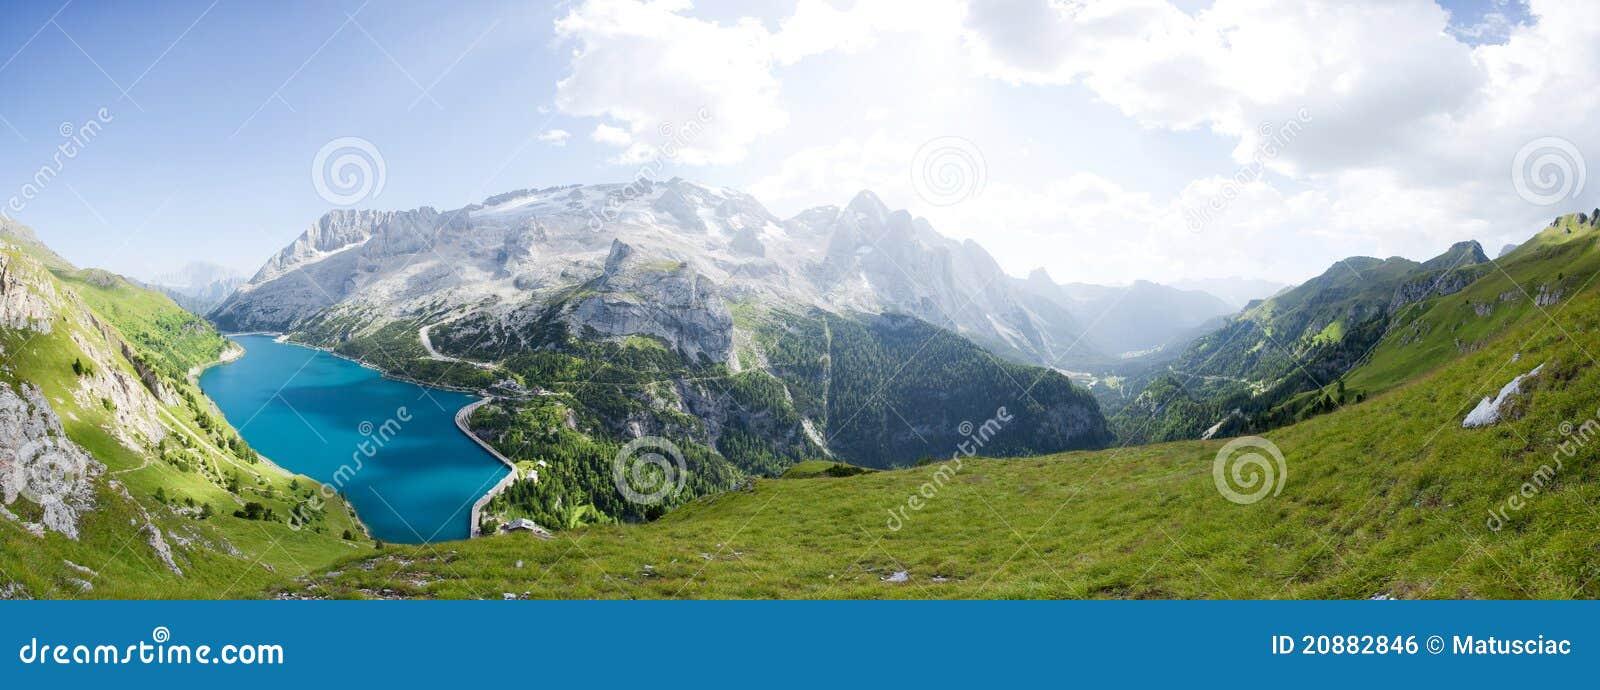 Härlig panorama för glaciärmarmoladaberg